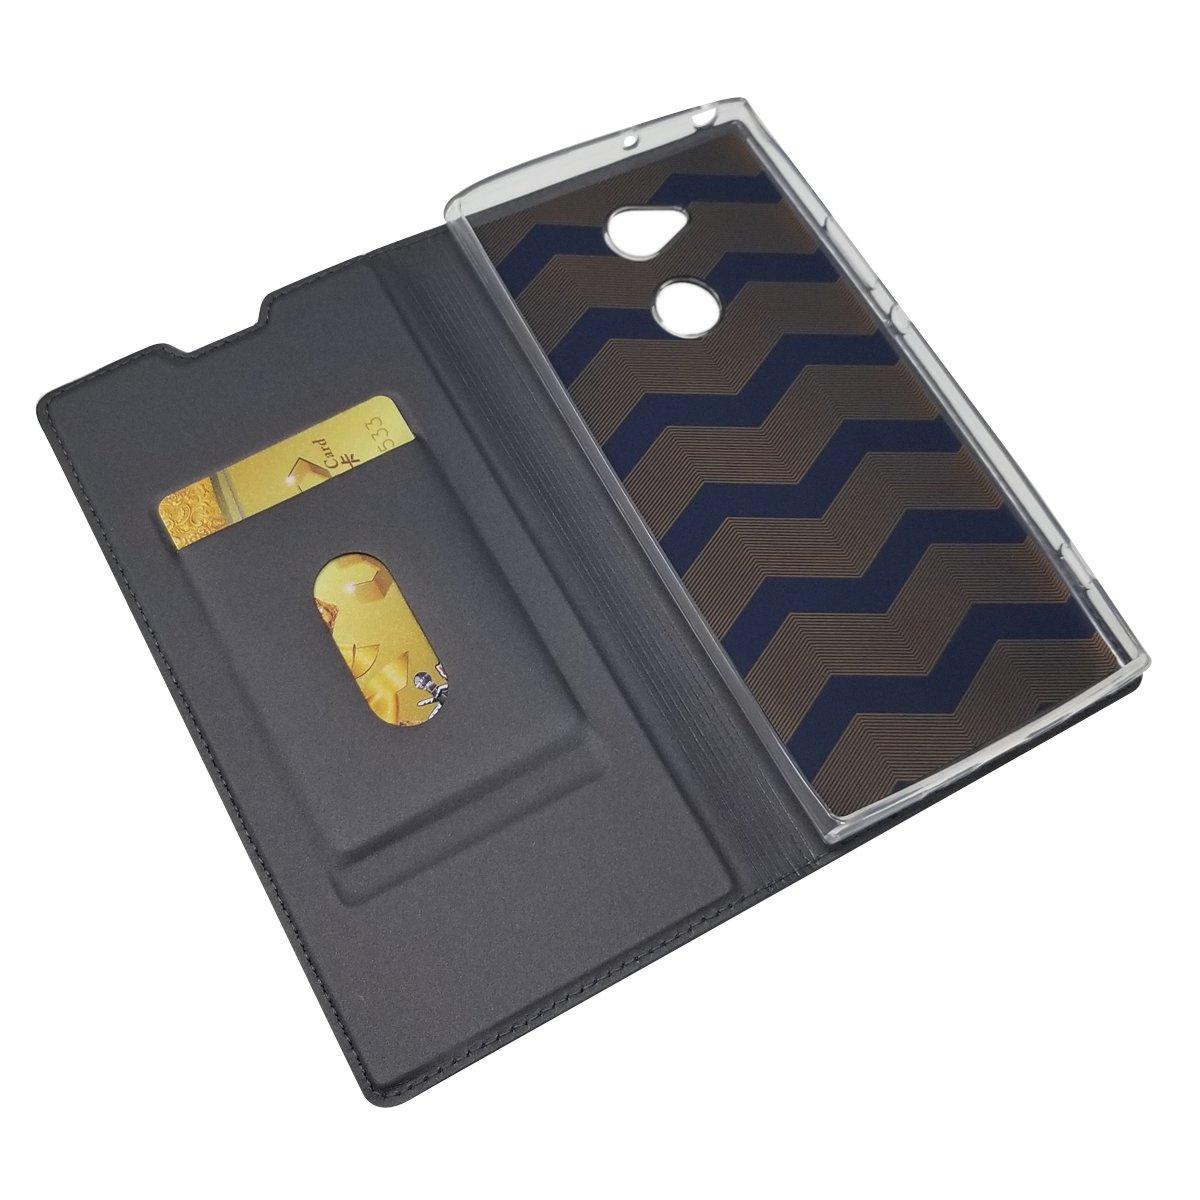 Homory Sony Xperia XA2 Ultra Wallet Multi Card Holder Backcase Bumper Folio PU Leather Cover with Bumper Case for Sony Xperia XA2 Ultra Black